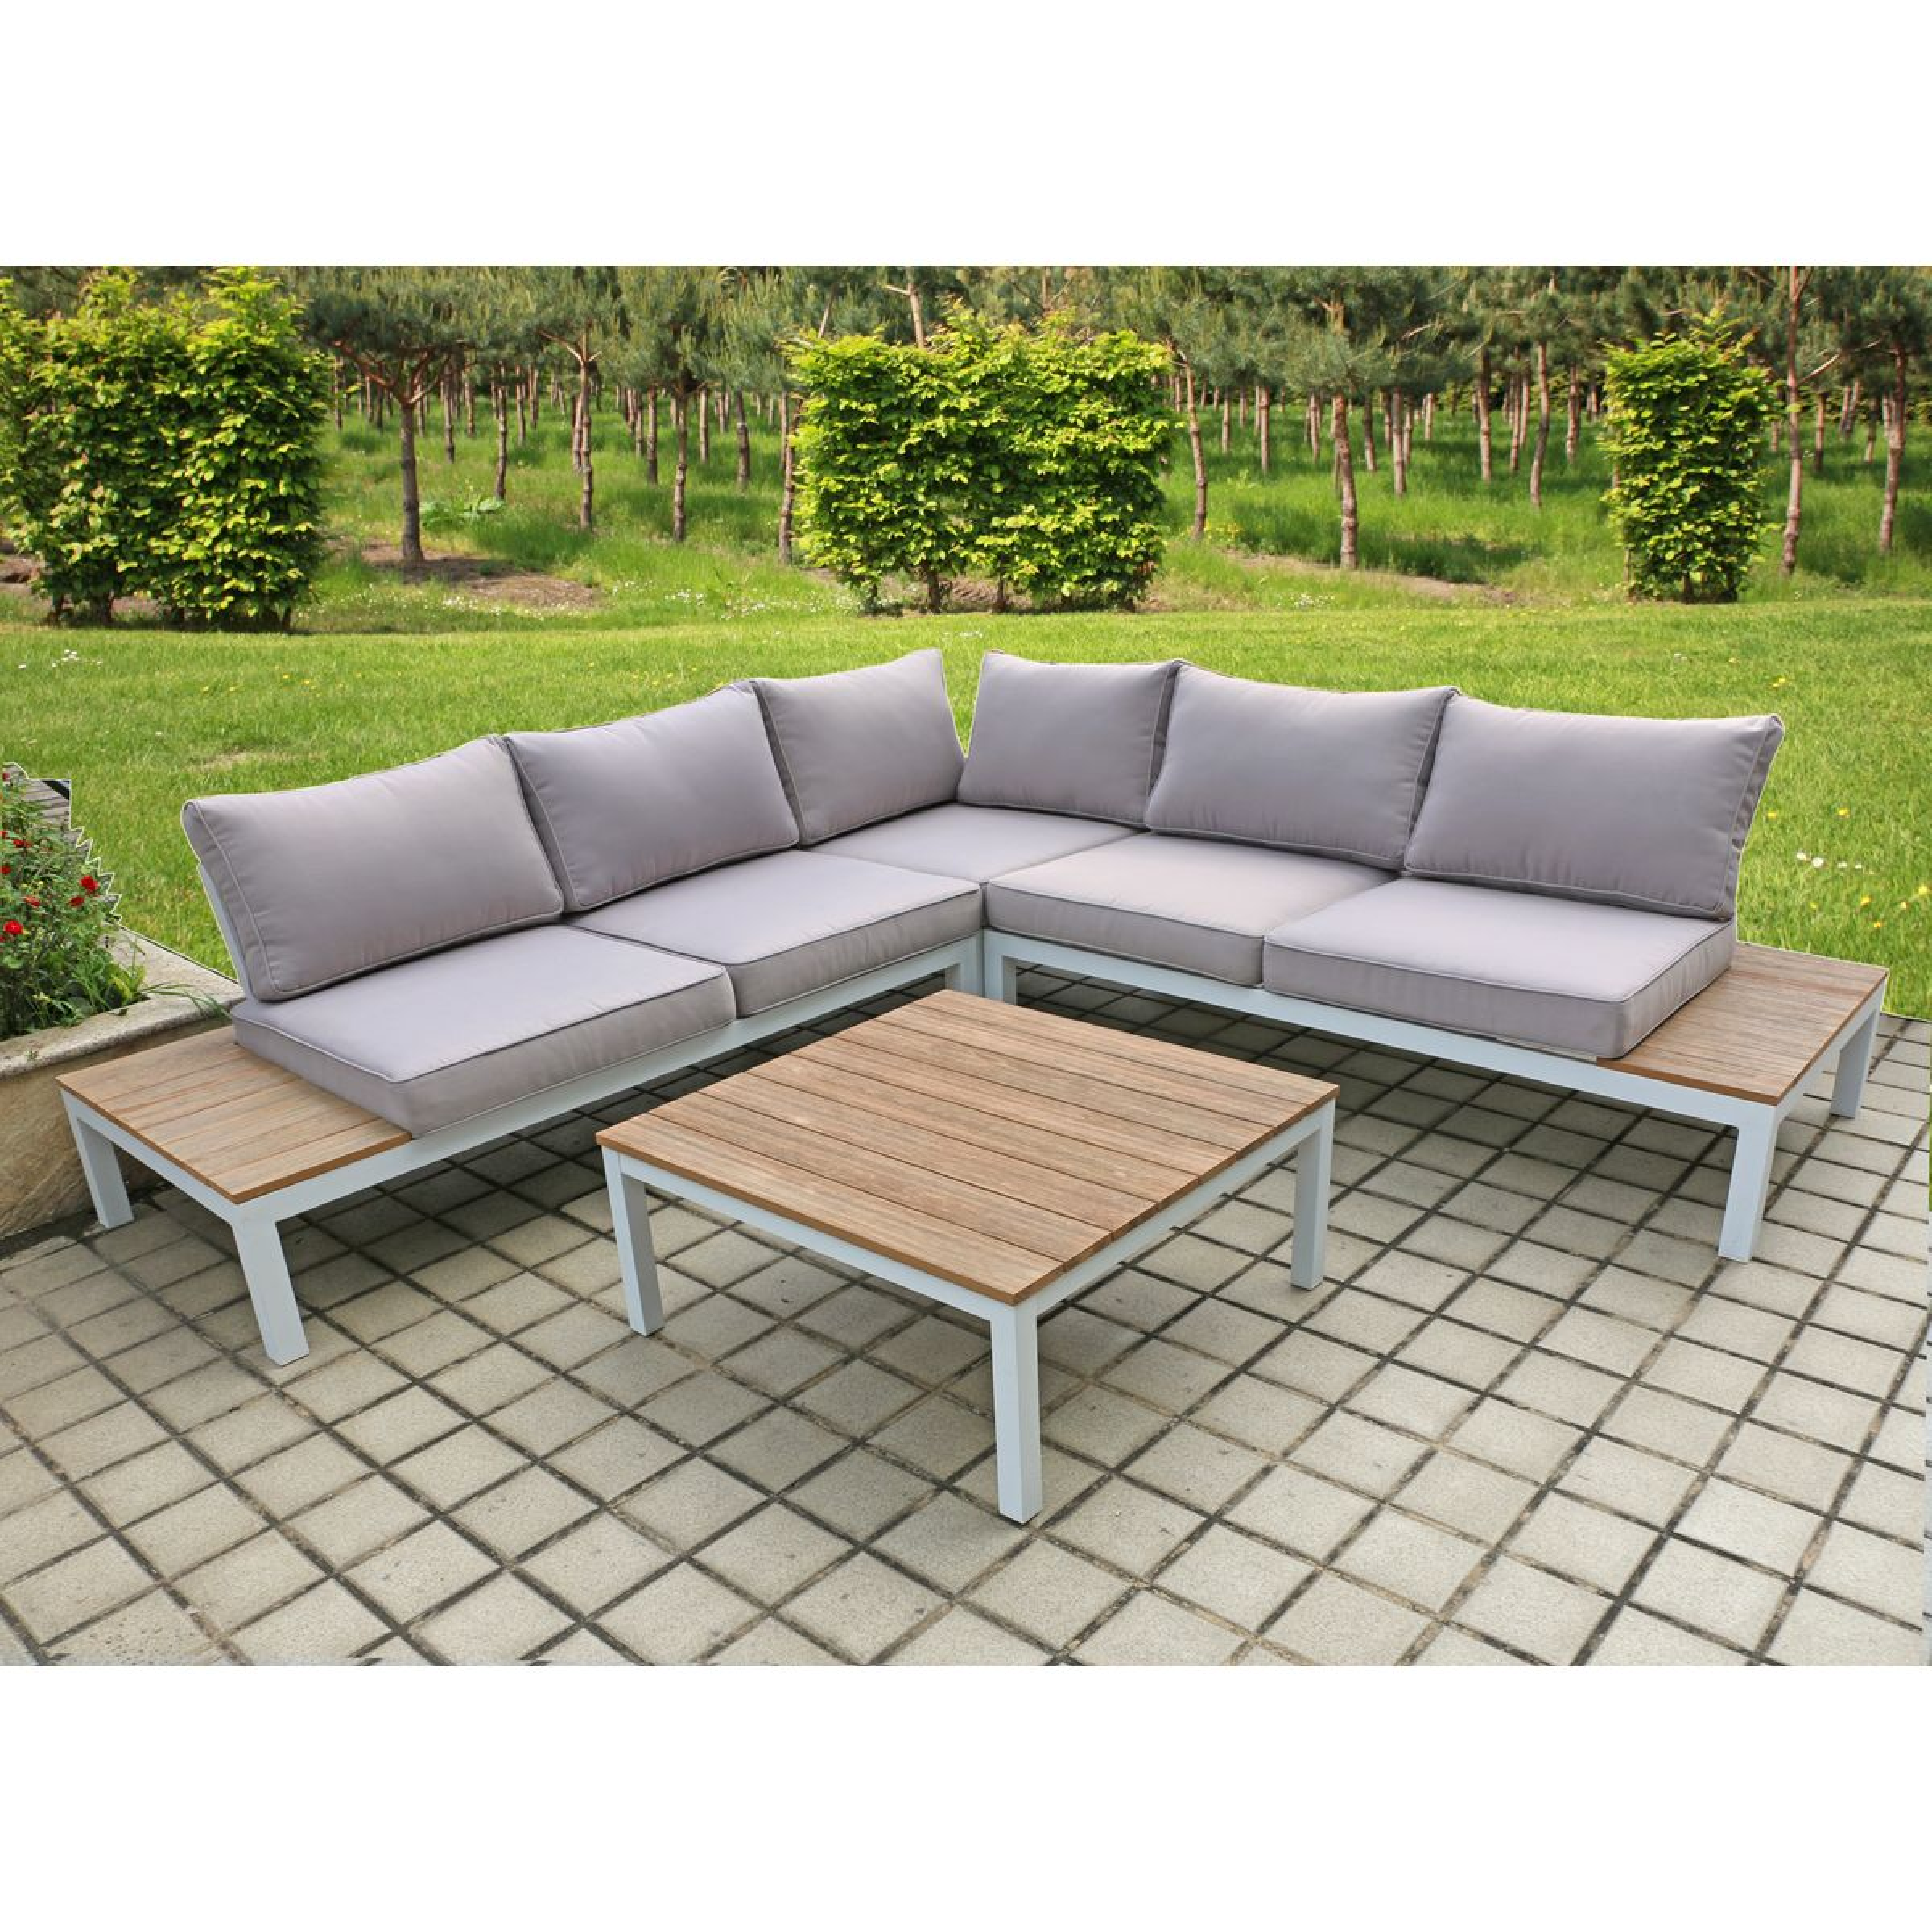 4 Tlg Lounge Set Sitzecke Sitzgruppe Tischgruppe Gartengruppe Bank Sofa Garten